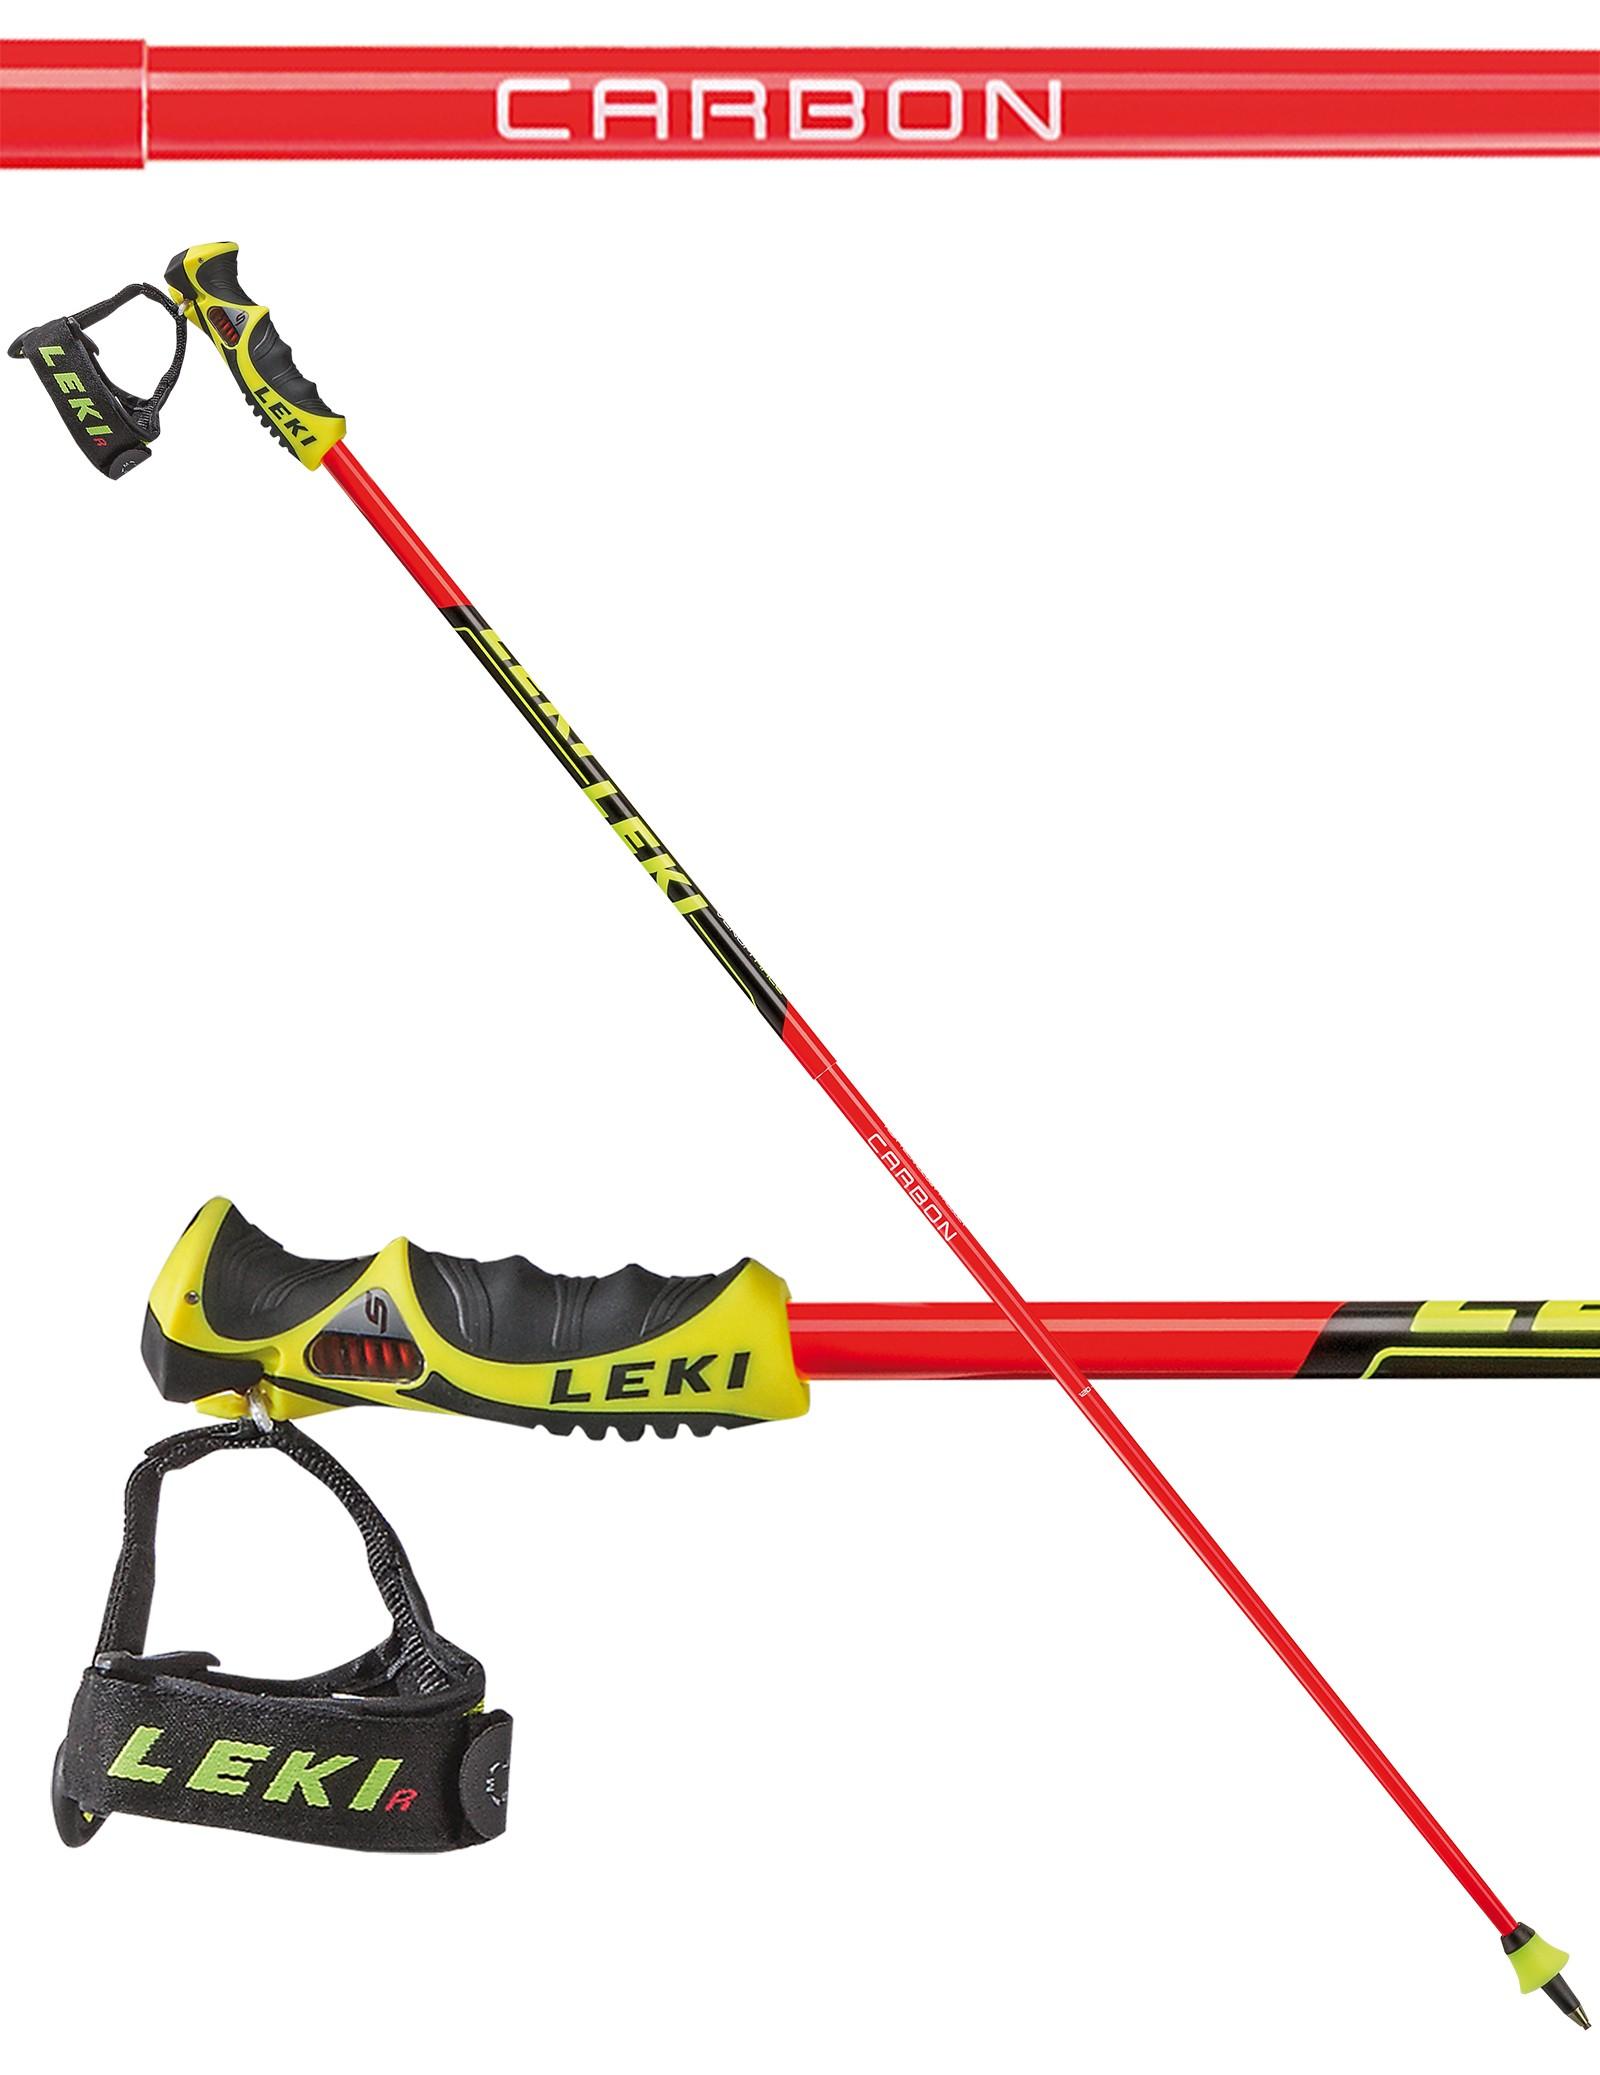 Leki Venom GS TRS ski poles, 2017